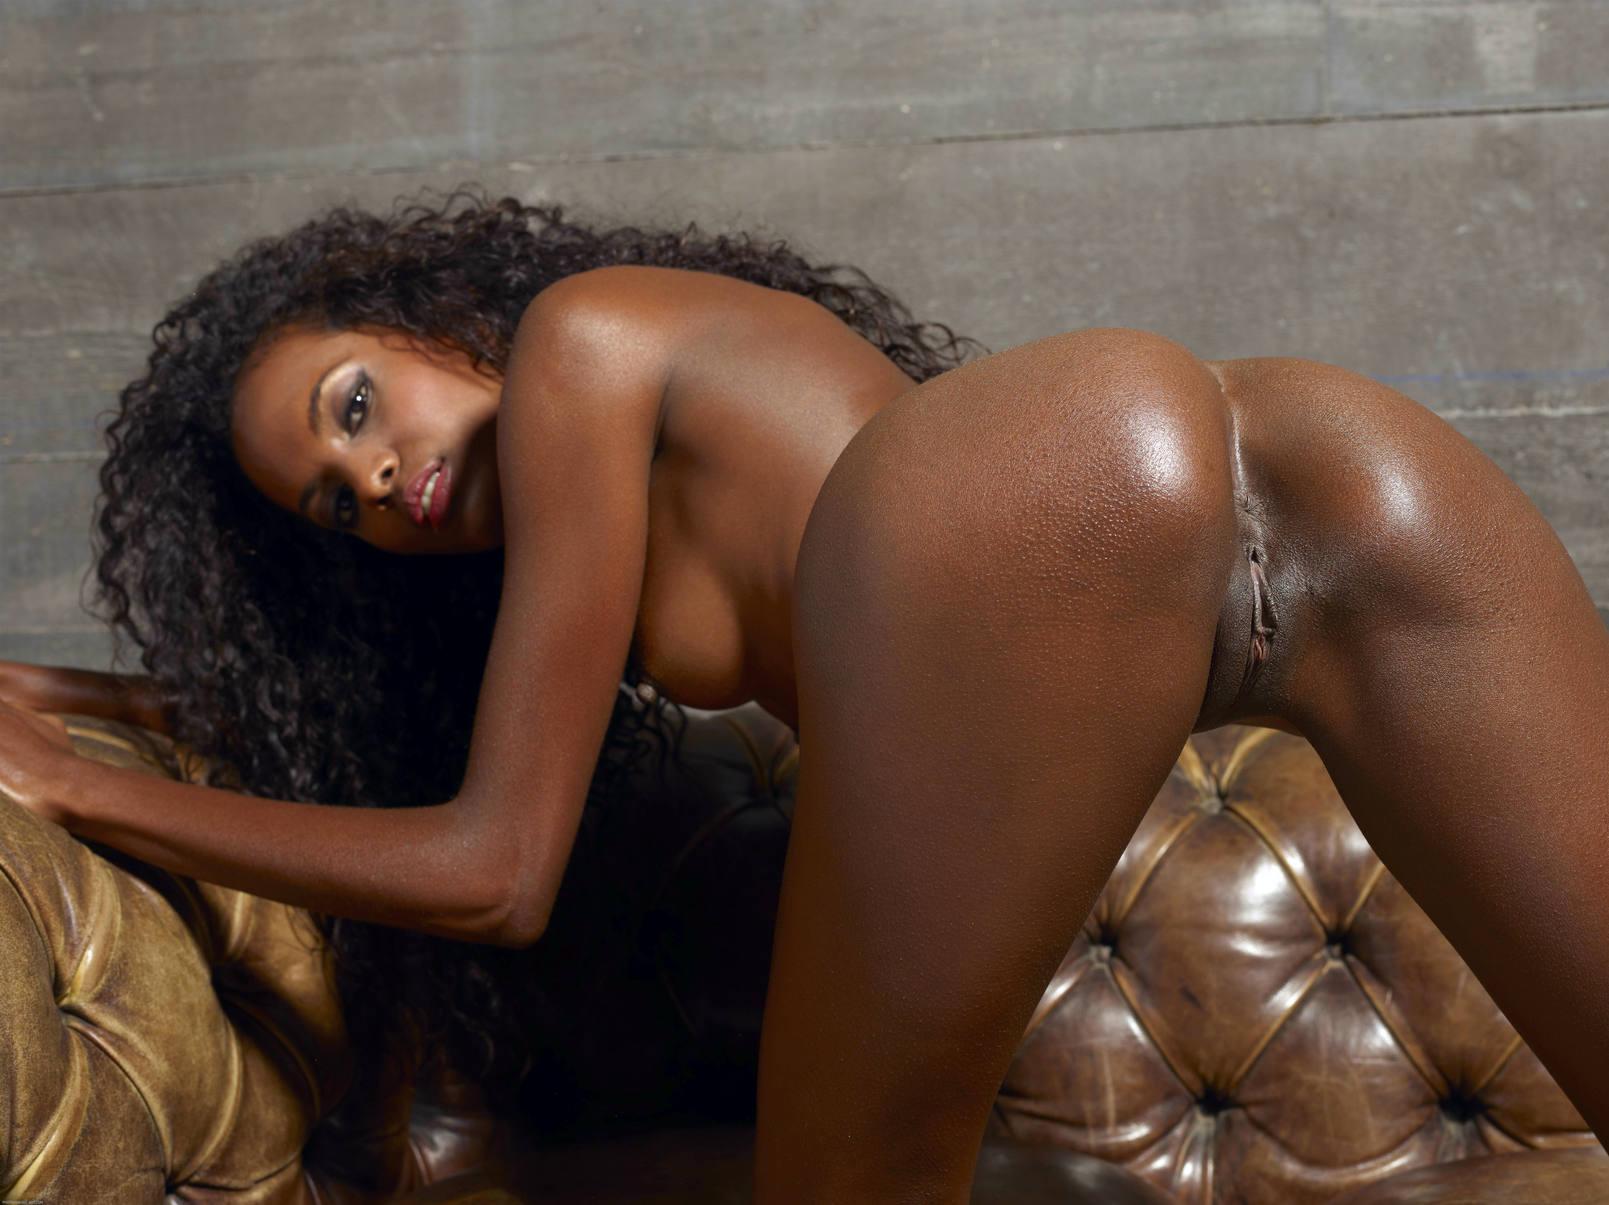 amazing tight black pussy - Nude-Ebony-Teen-Valerie-Shows-Oily-Tight-Black-Pussy_www.EroticVilla.com_14  – EroticVilla